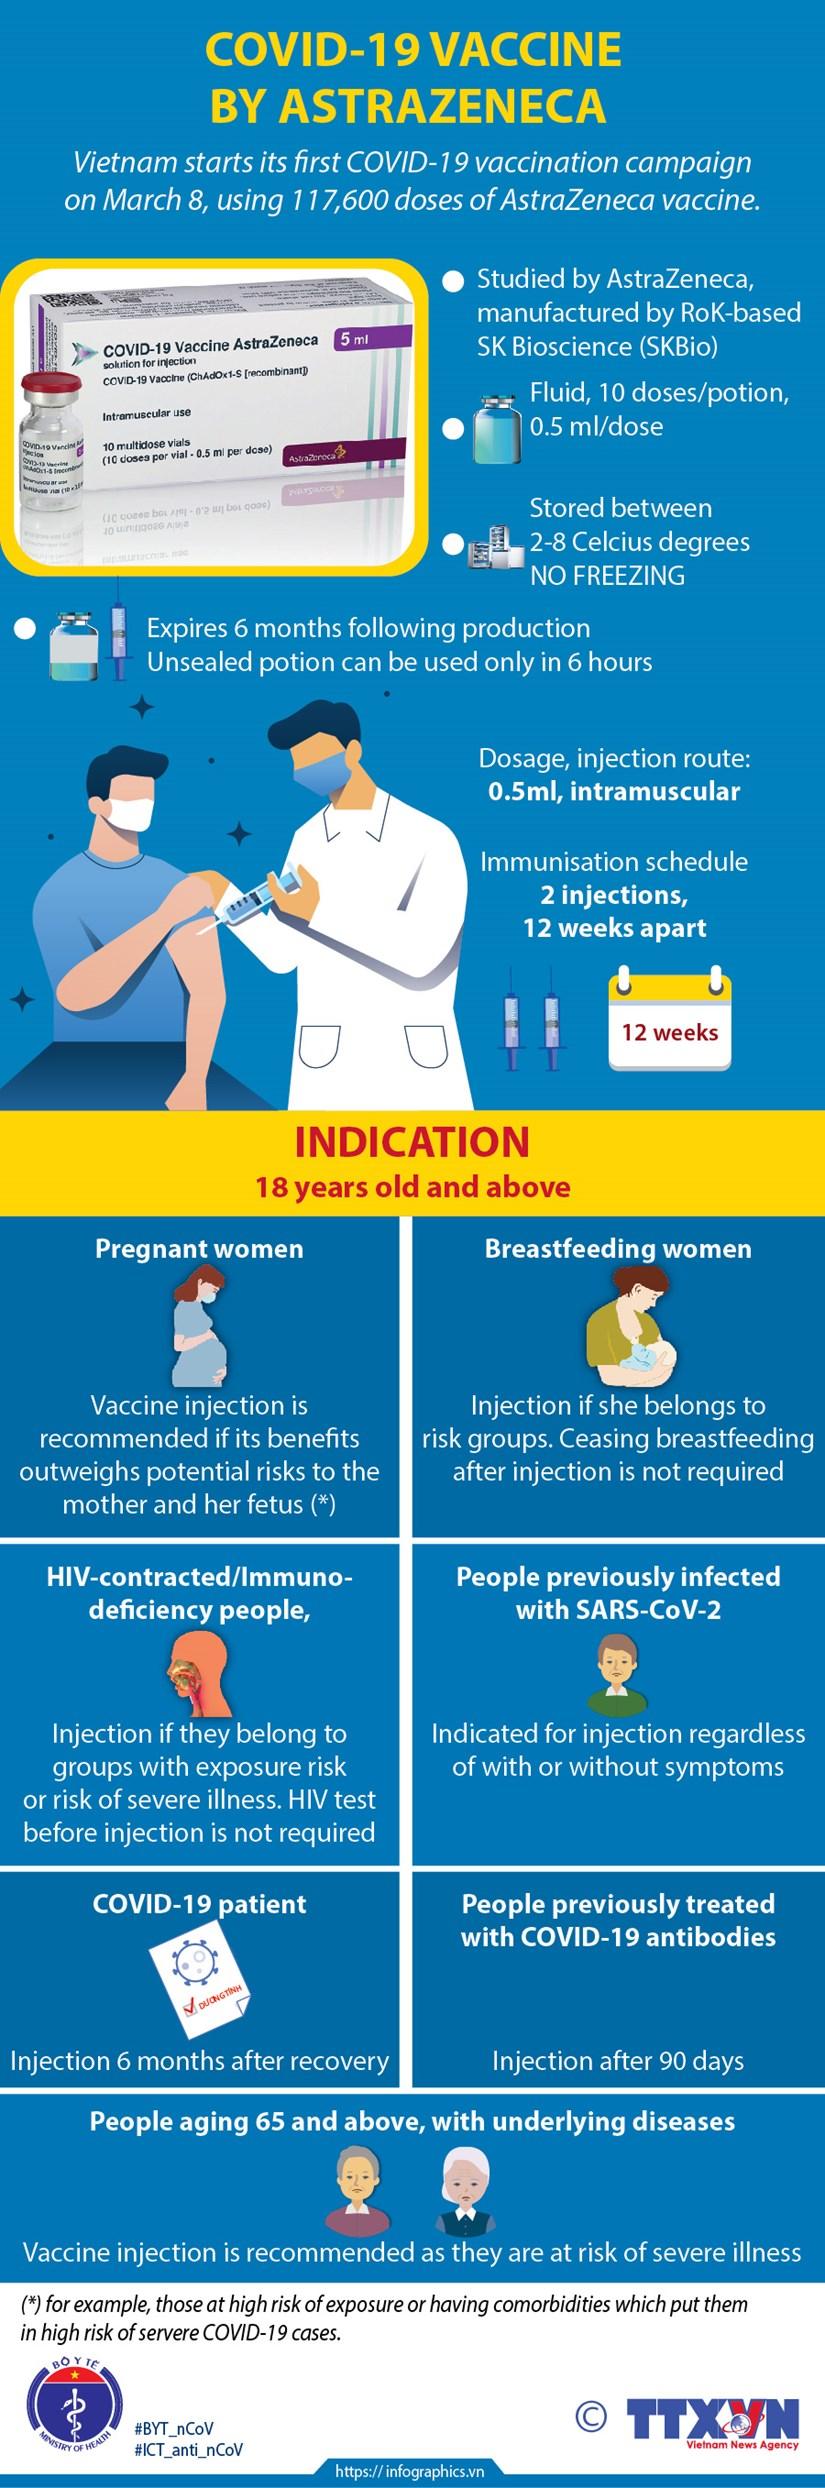 COVID-19 vaccine by AstraZeneca hinh anh 1